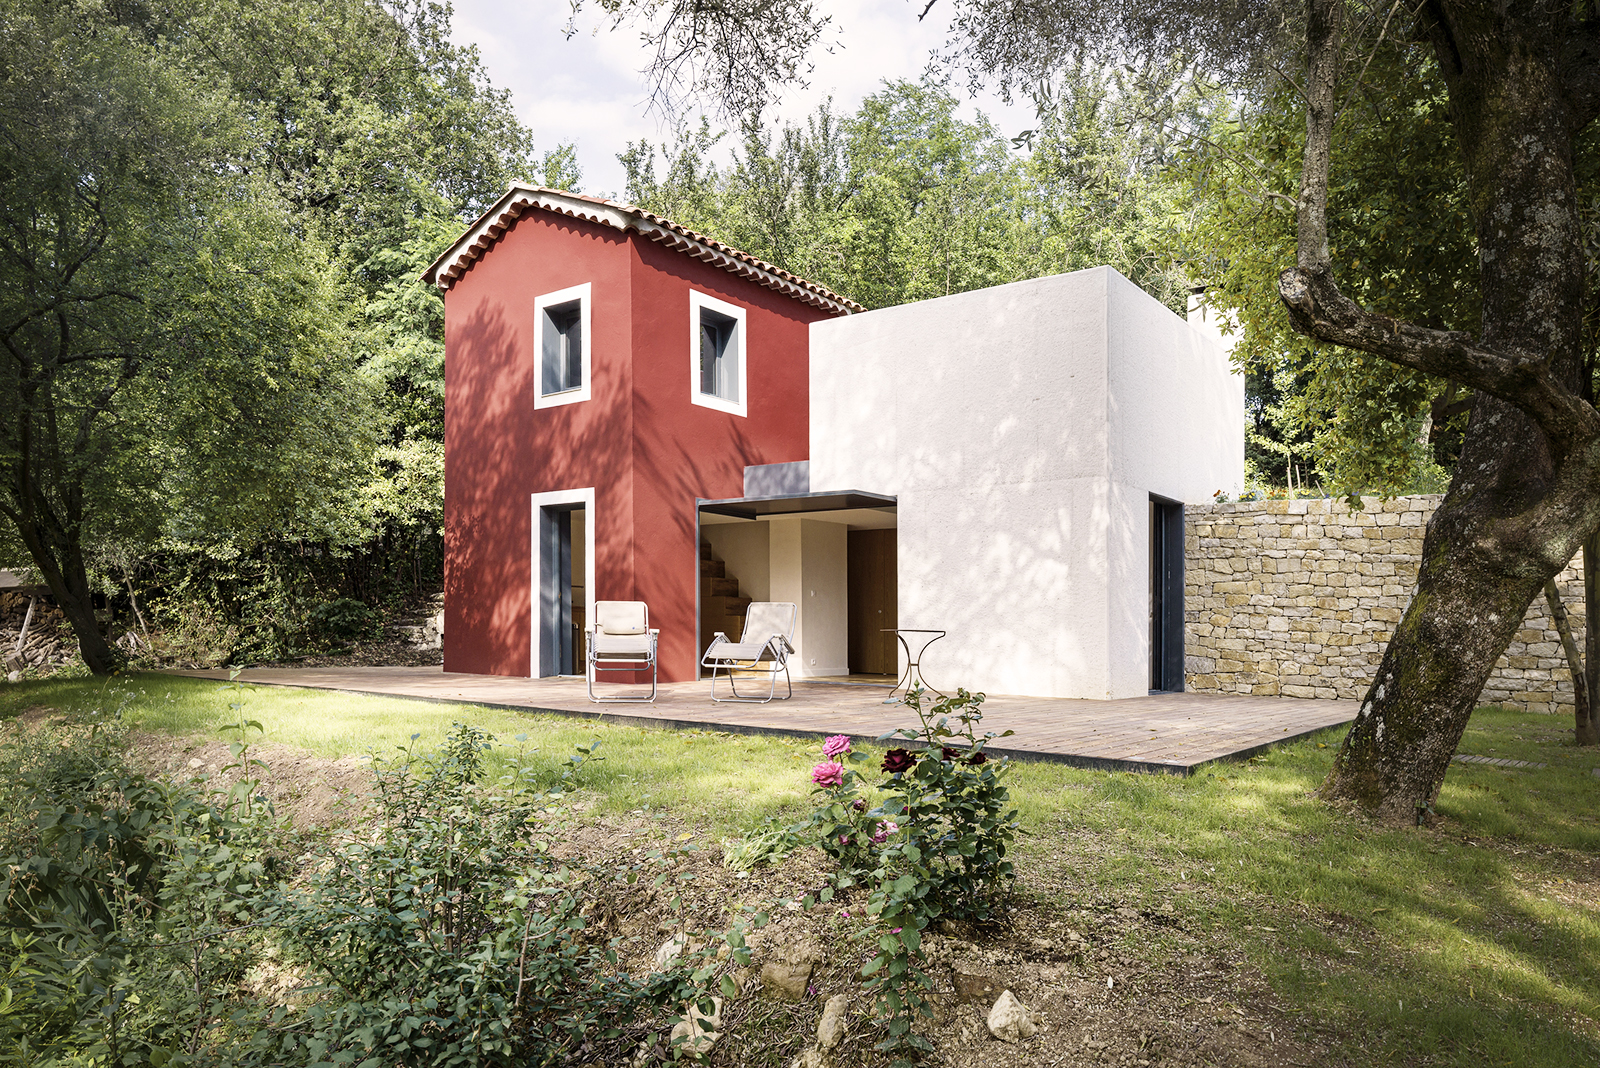 contact architecte dplg nice ccarchitecte cyril ch nebeau. Black Bedroom Furniture Sets. Home Design Ideas